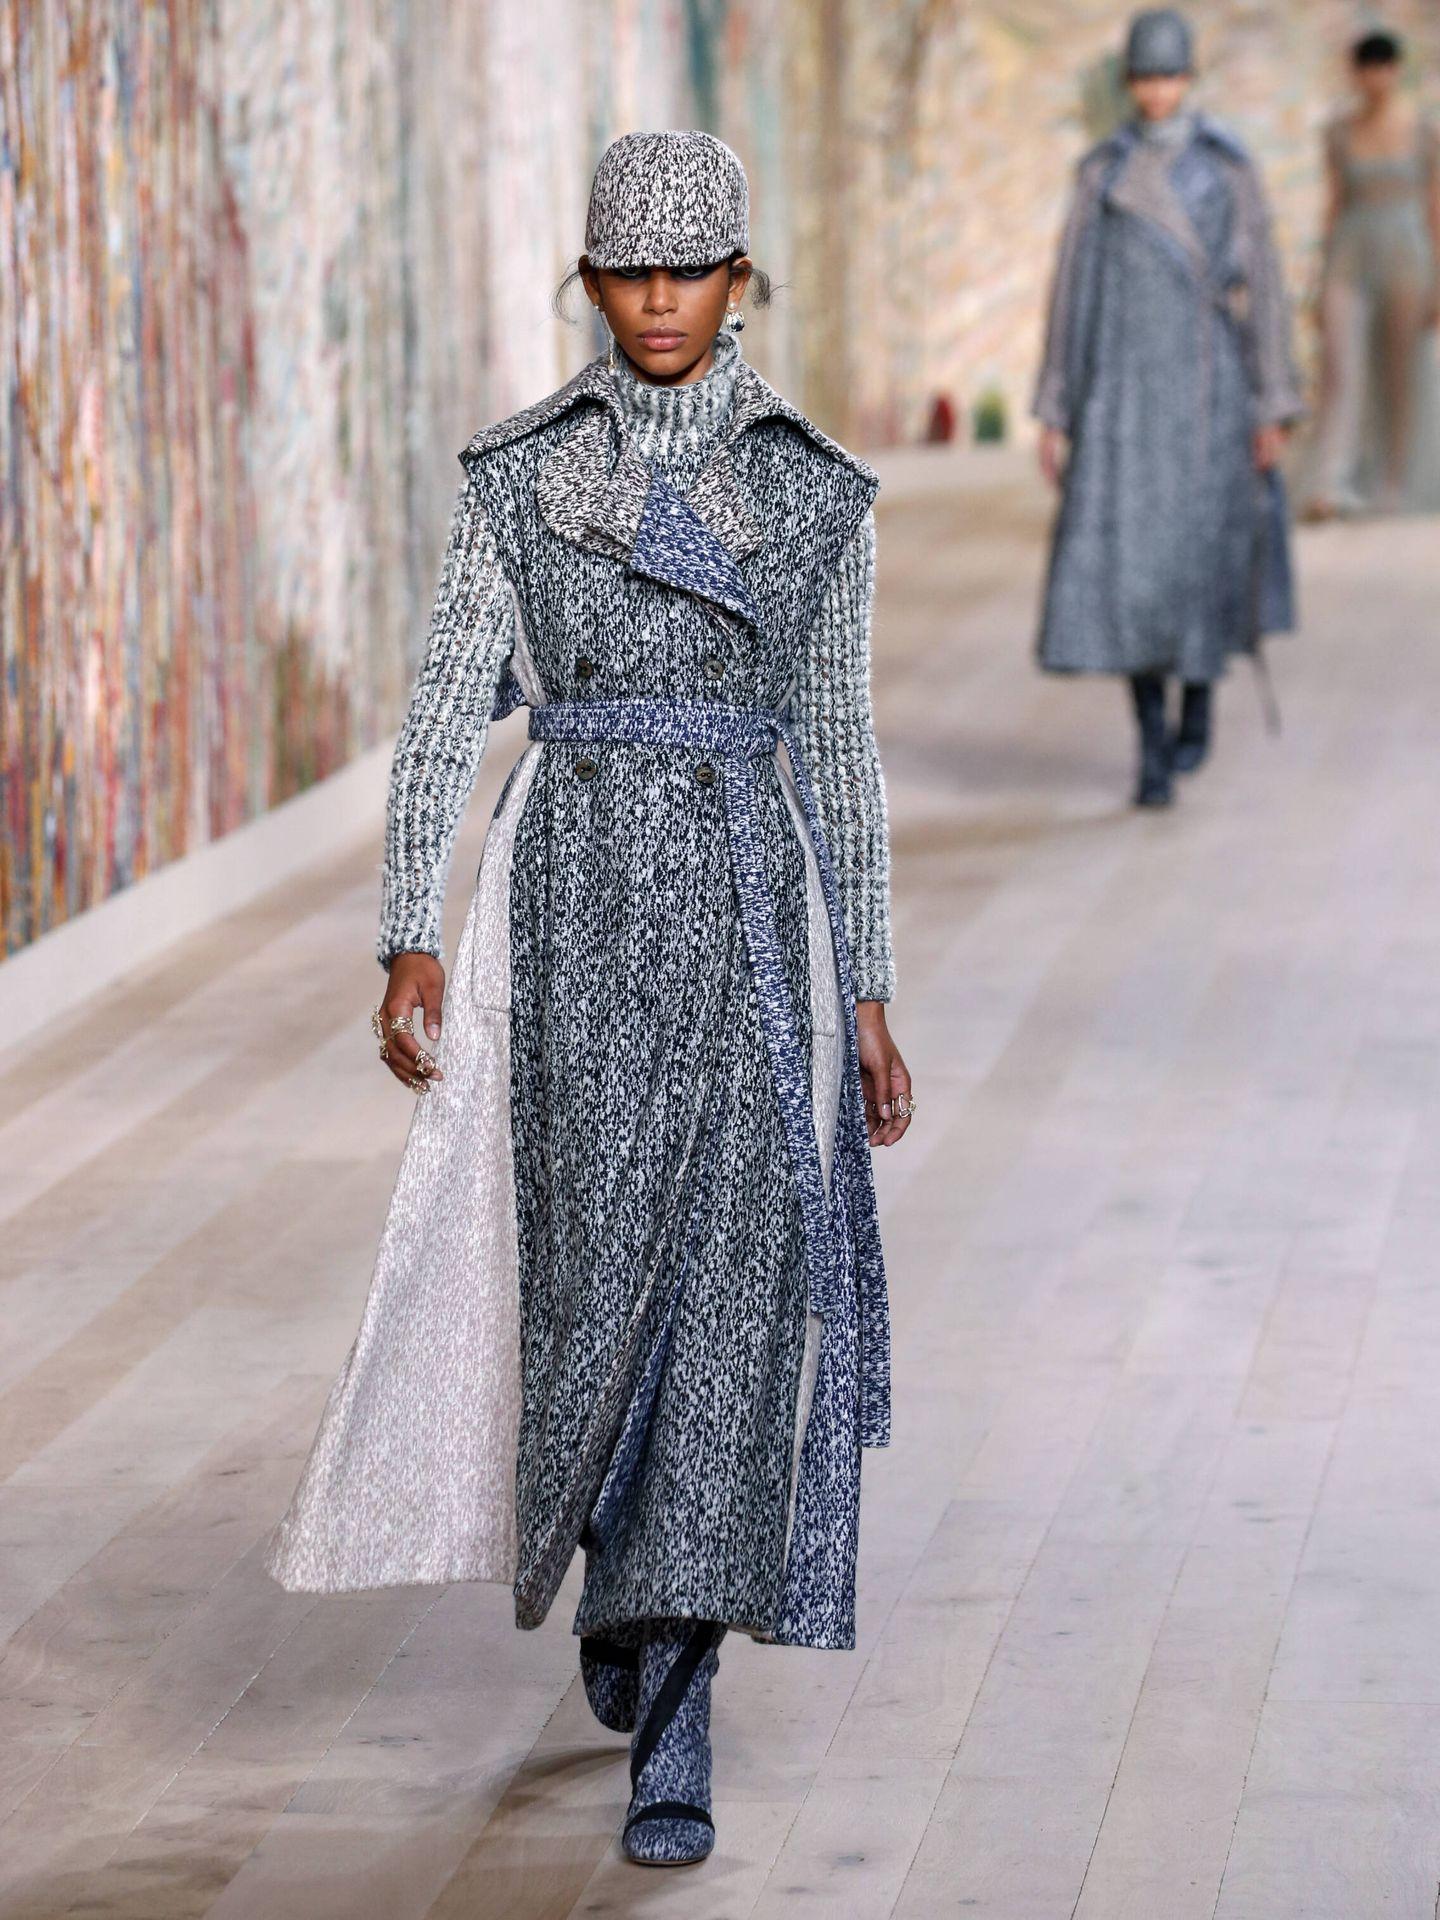 Desfile de Dior Haute Couture Fall/Winter 2021/2022 en París. (Getty)